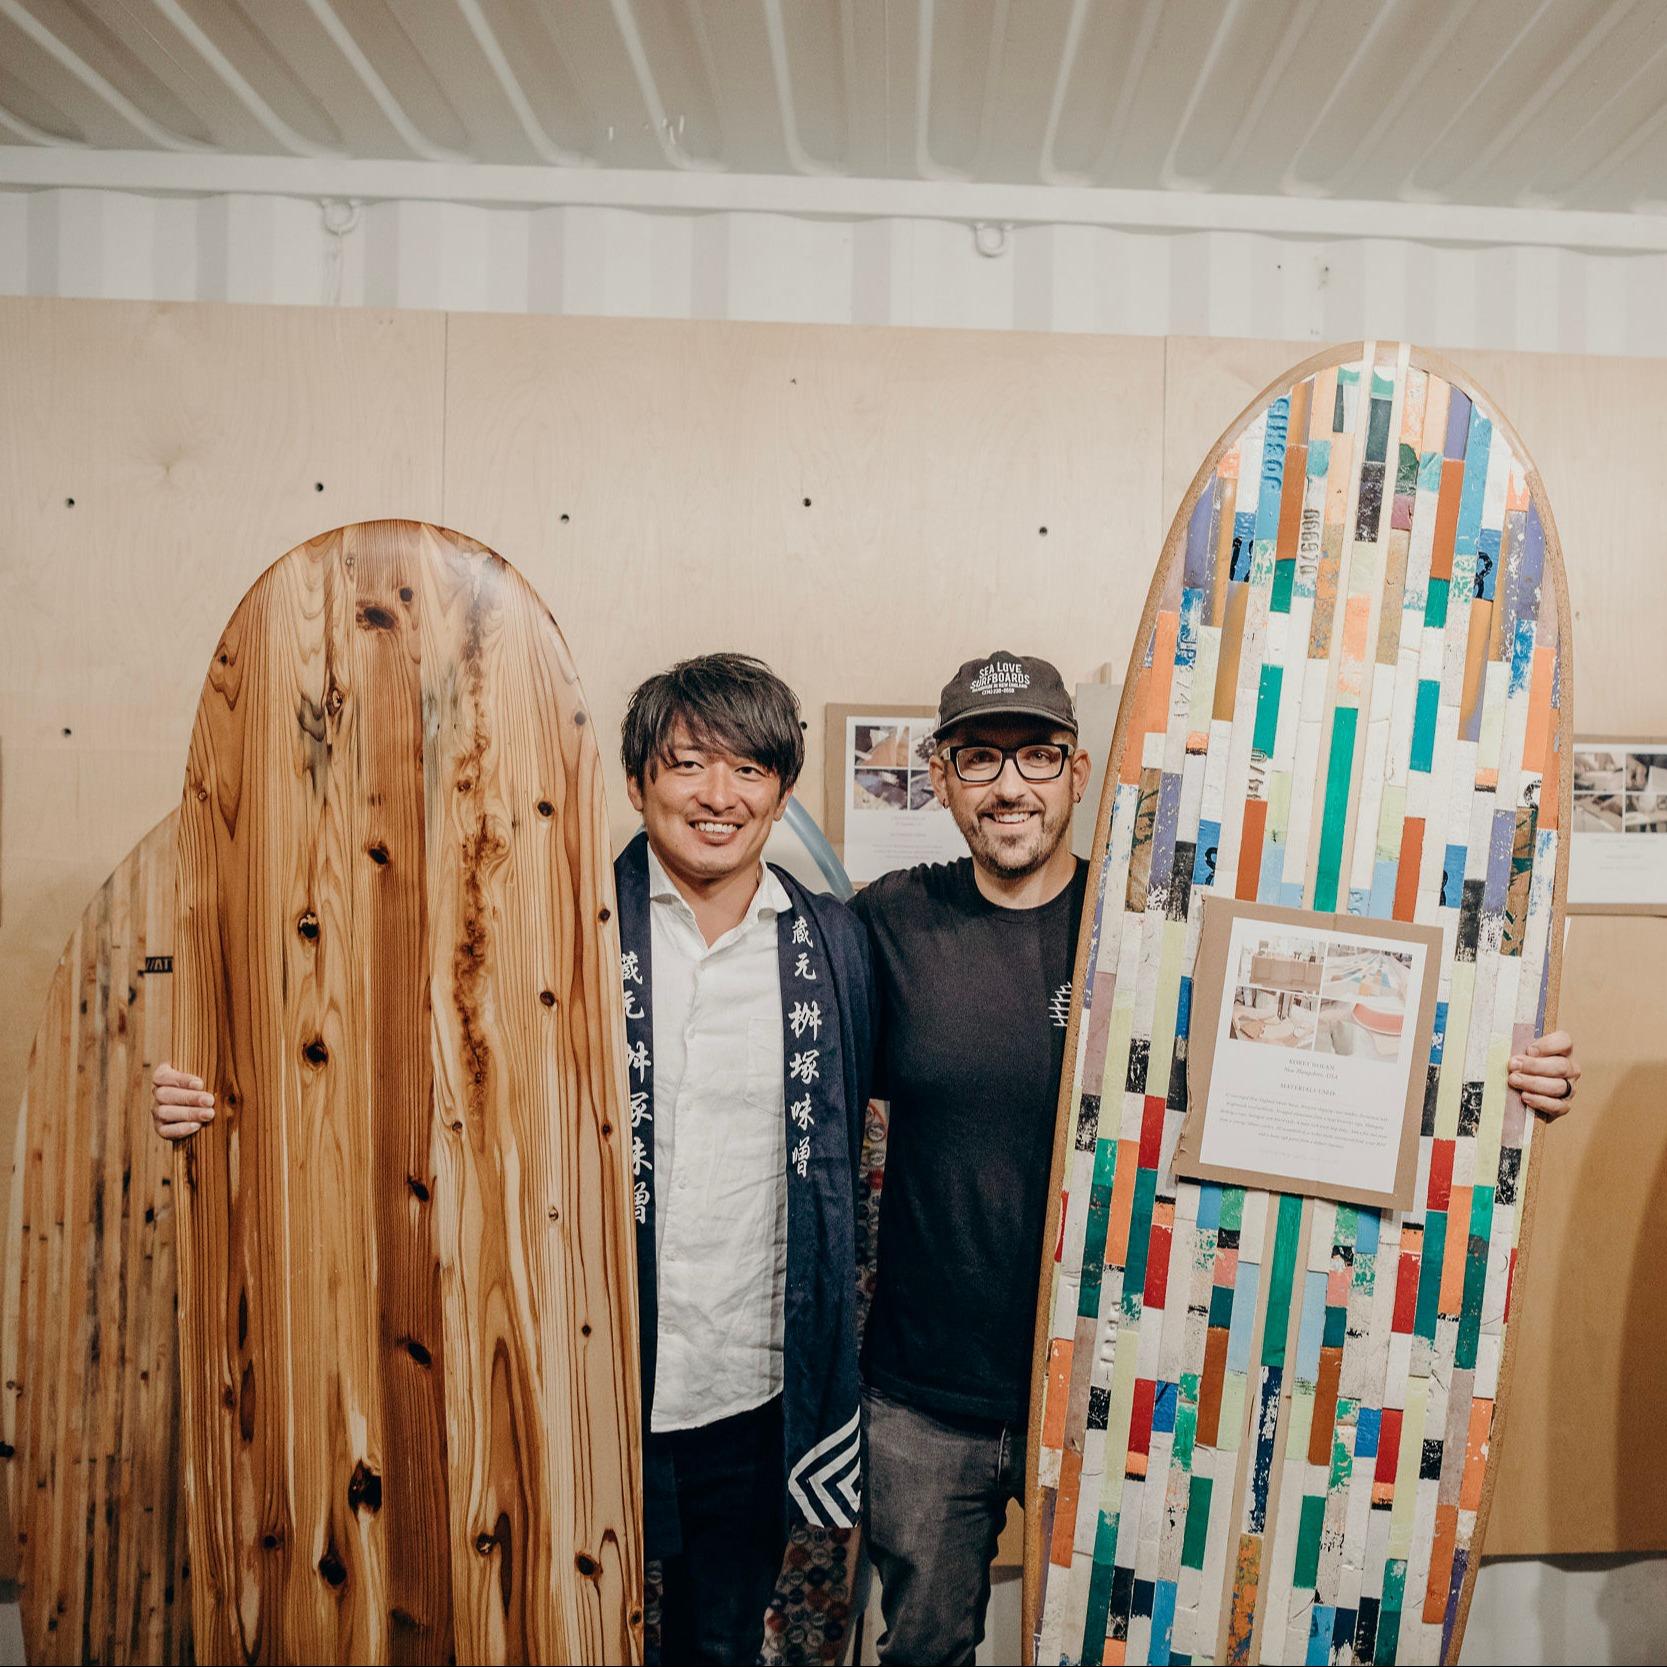 Surfrider x Vissla Upcycle Contest Winners